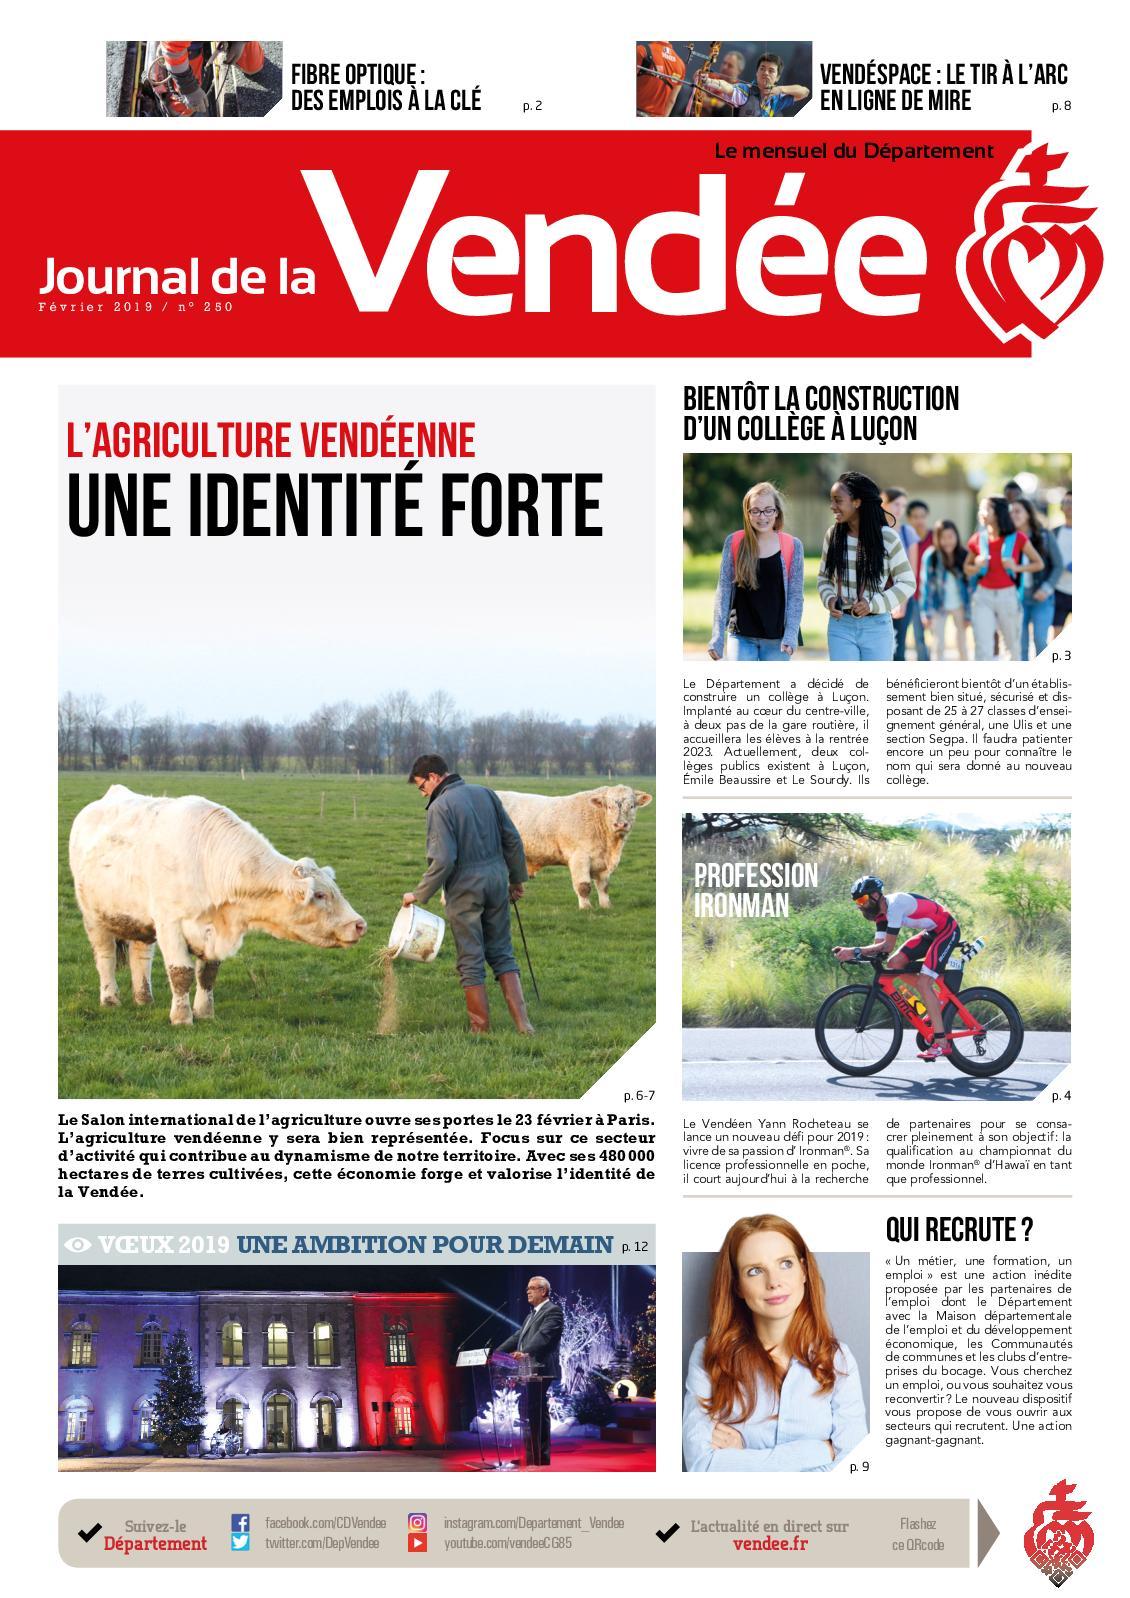 Randonnee Pedestre Vendee Calendrier 2020.Calameo Journal De La Vendee N 250 Fevrier 2019